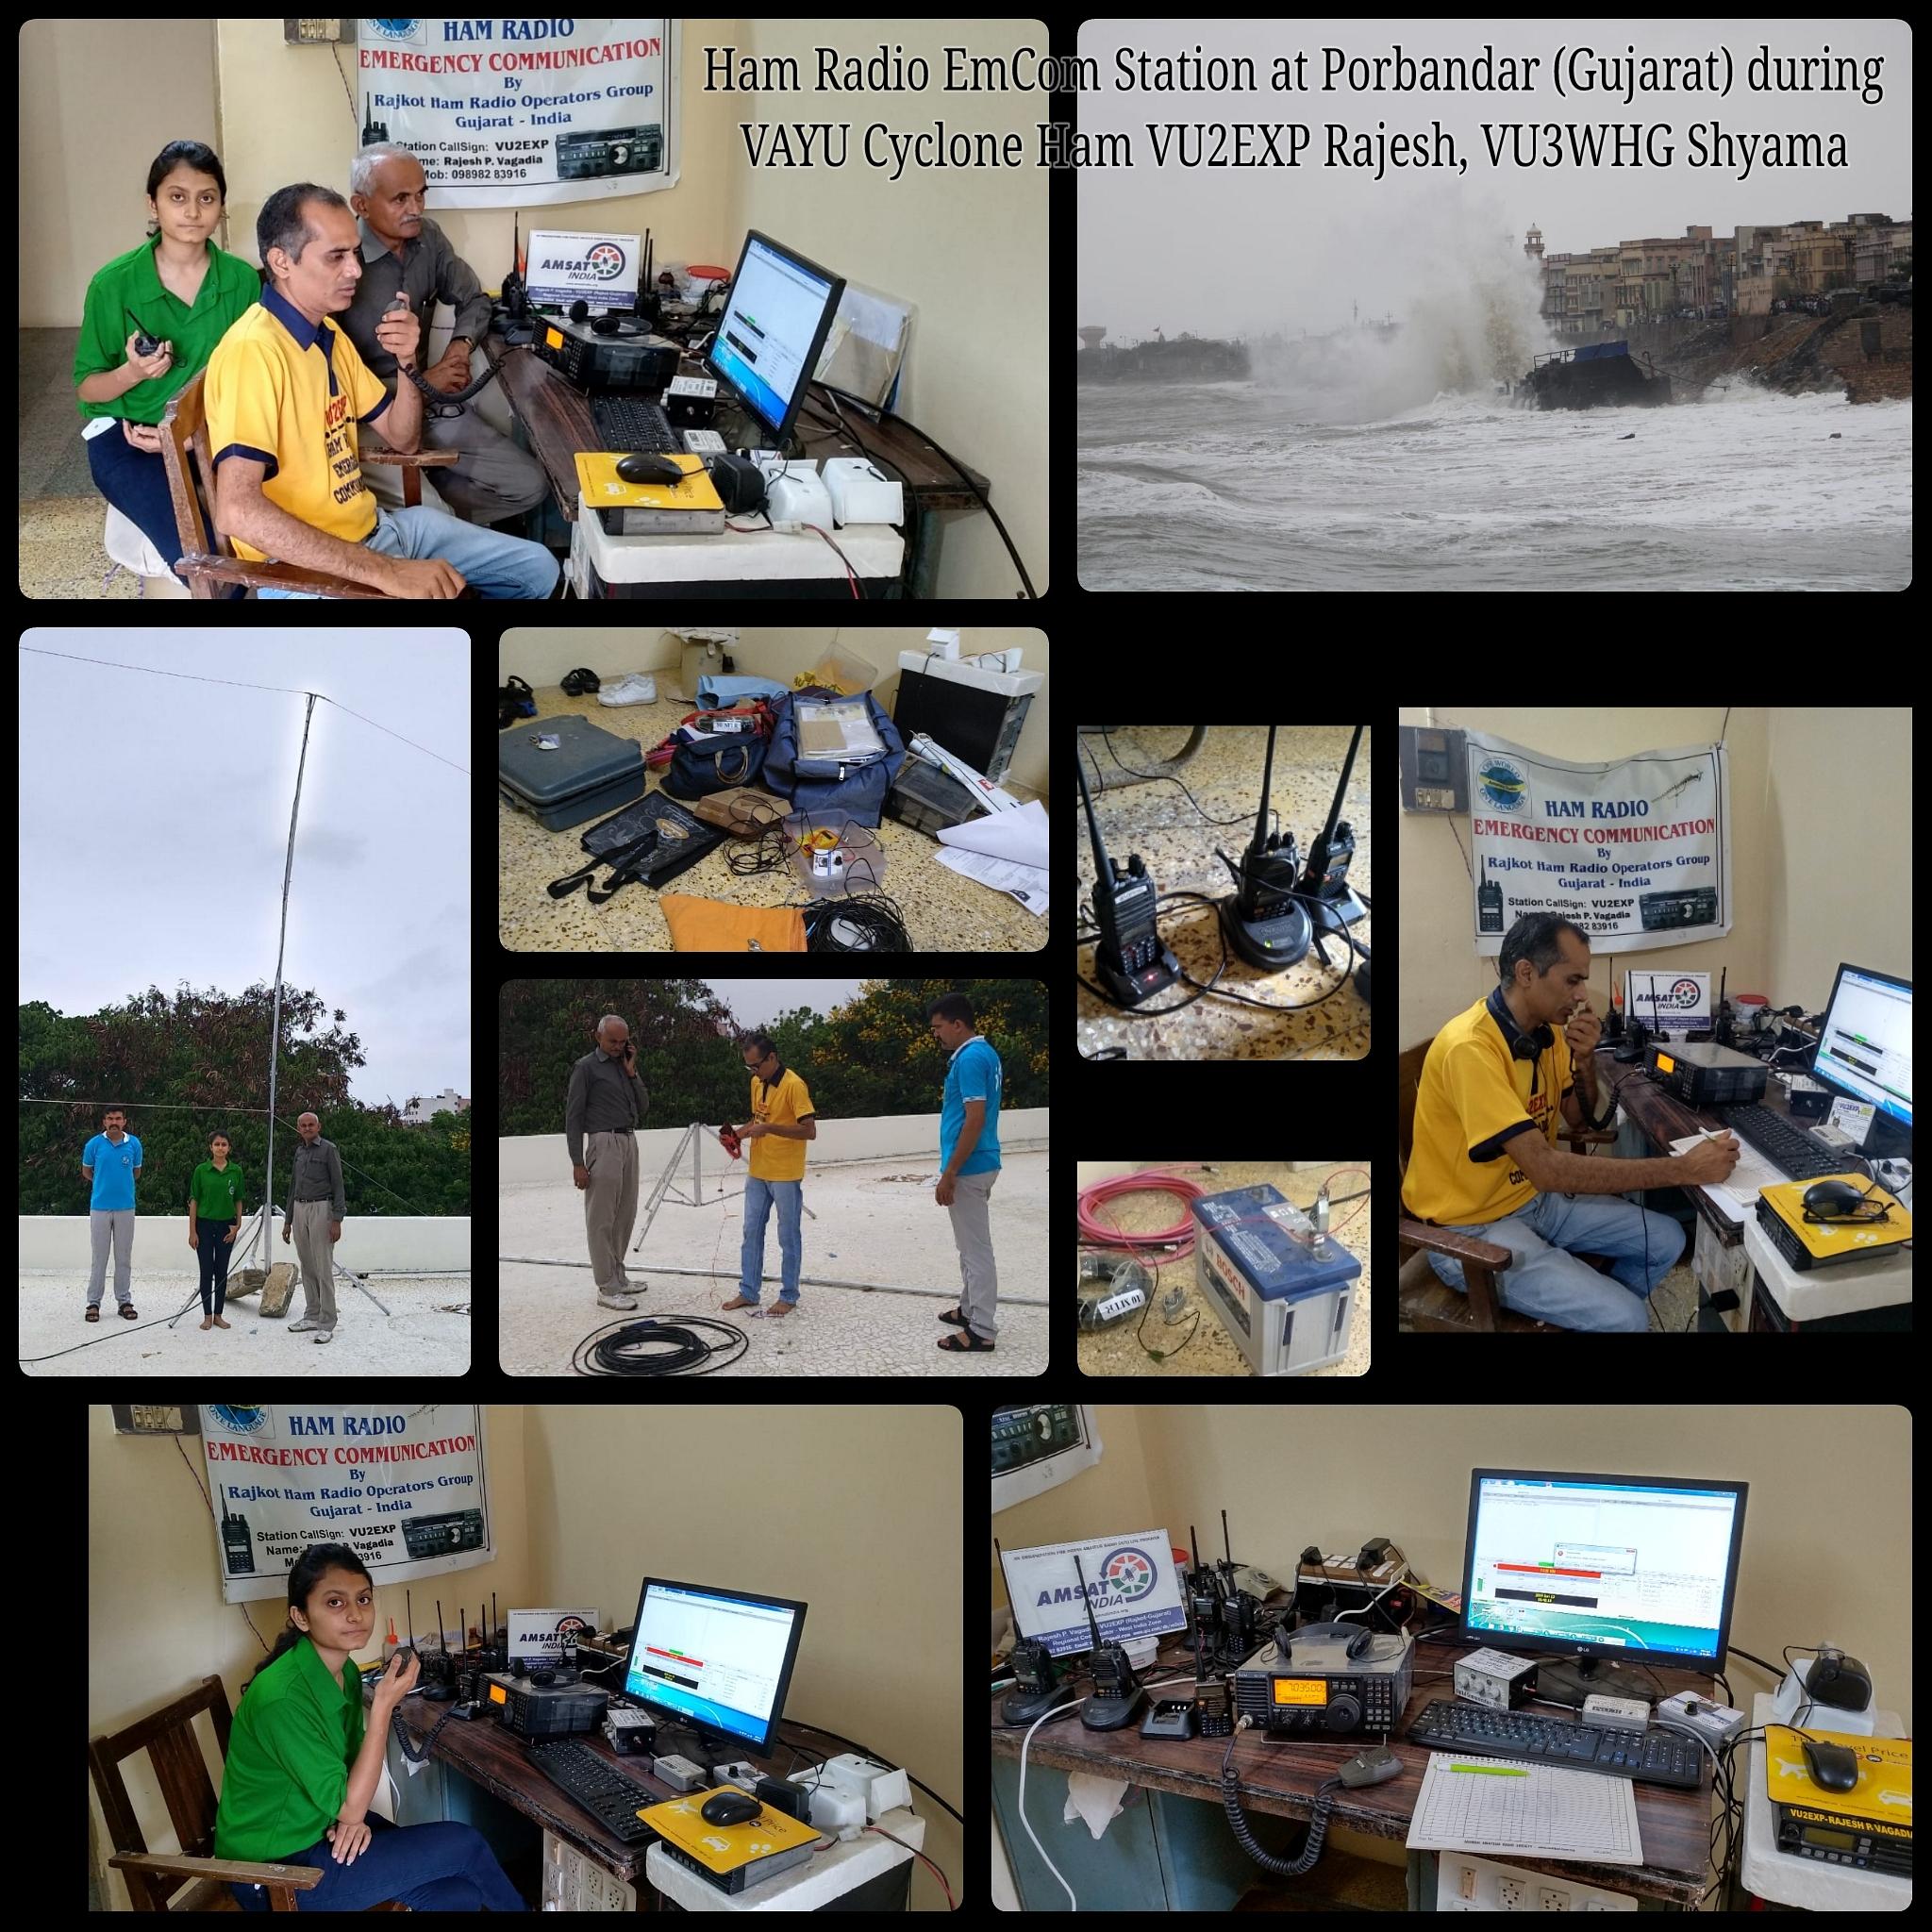 Ham Radio Communication Porbandar Gujarat Vayu Cyclone.jpg